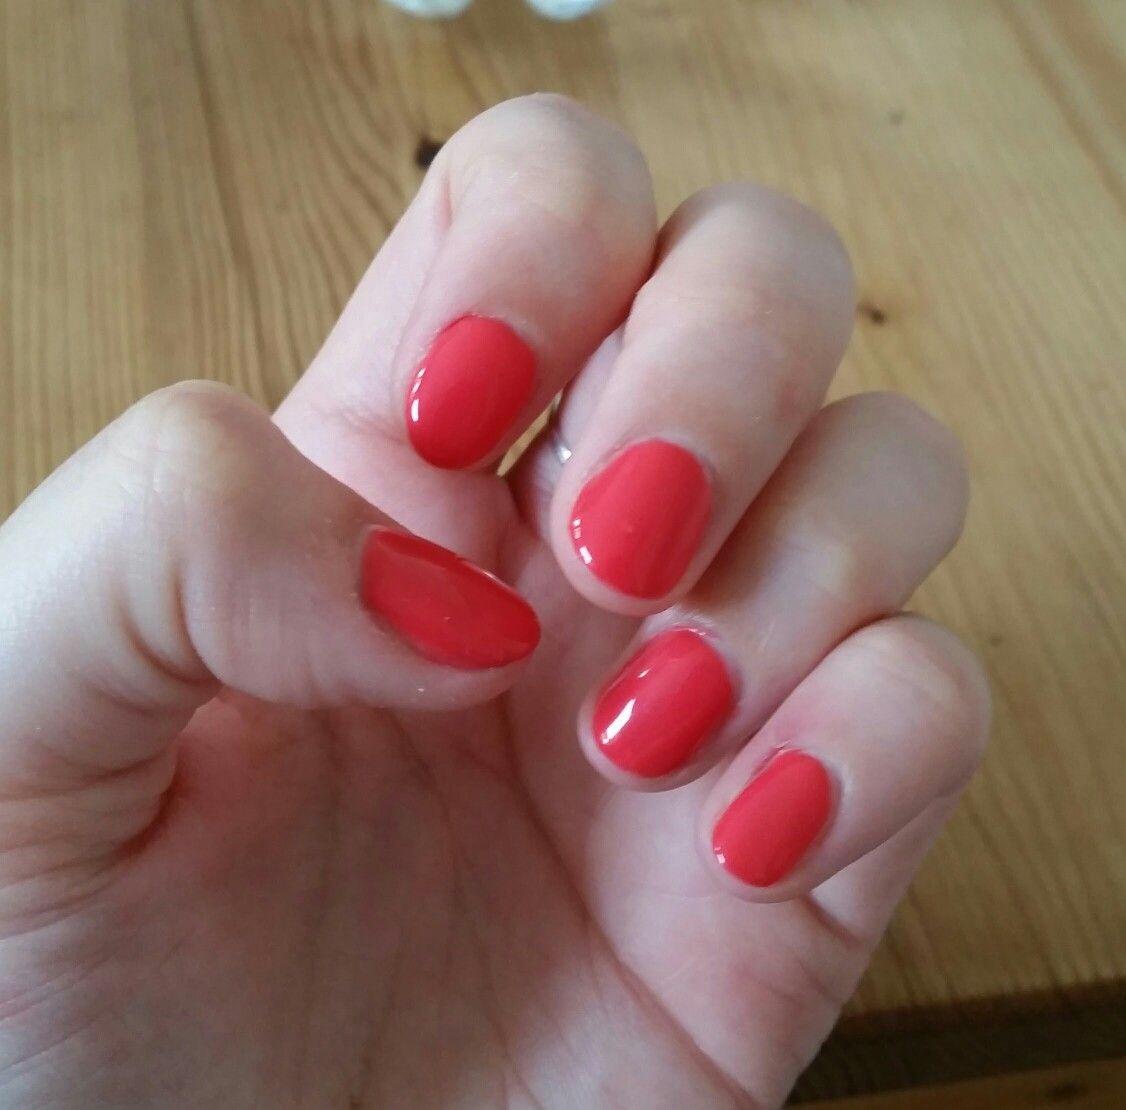 Elite99 Coral Red Pink Gel Nail Polish In 1331